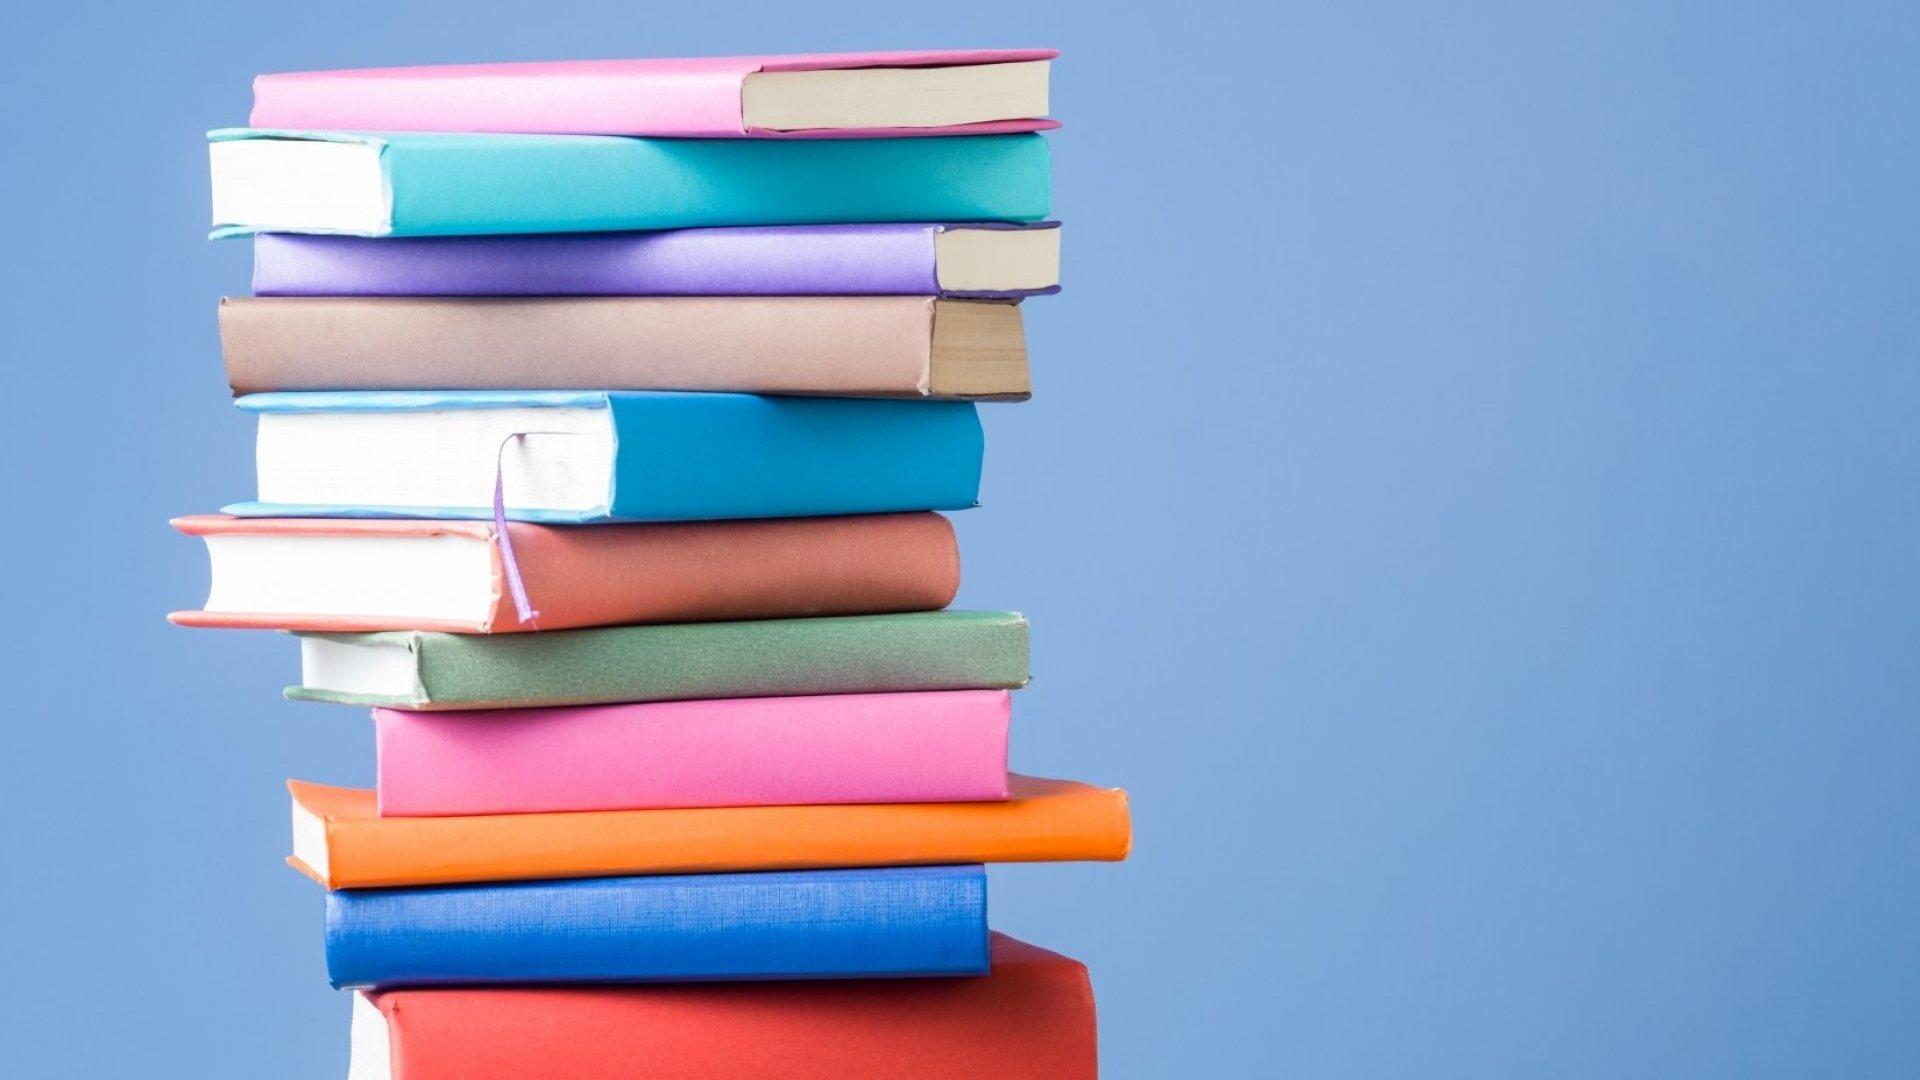 SAP Fiori Application Developer Certification Books / Material